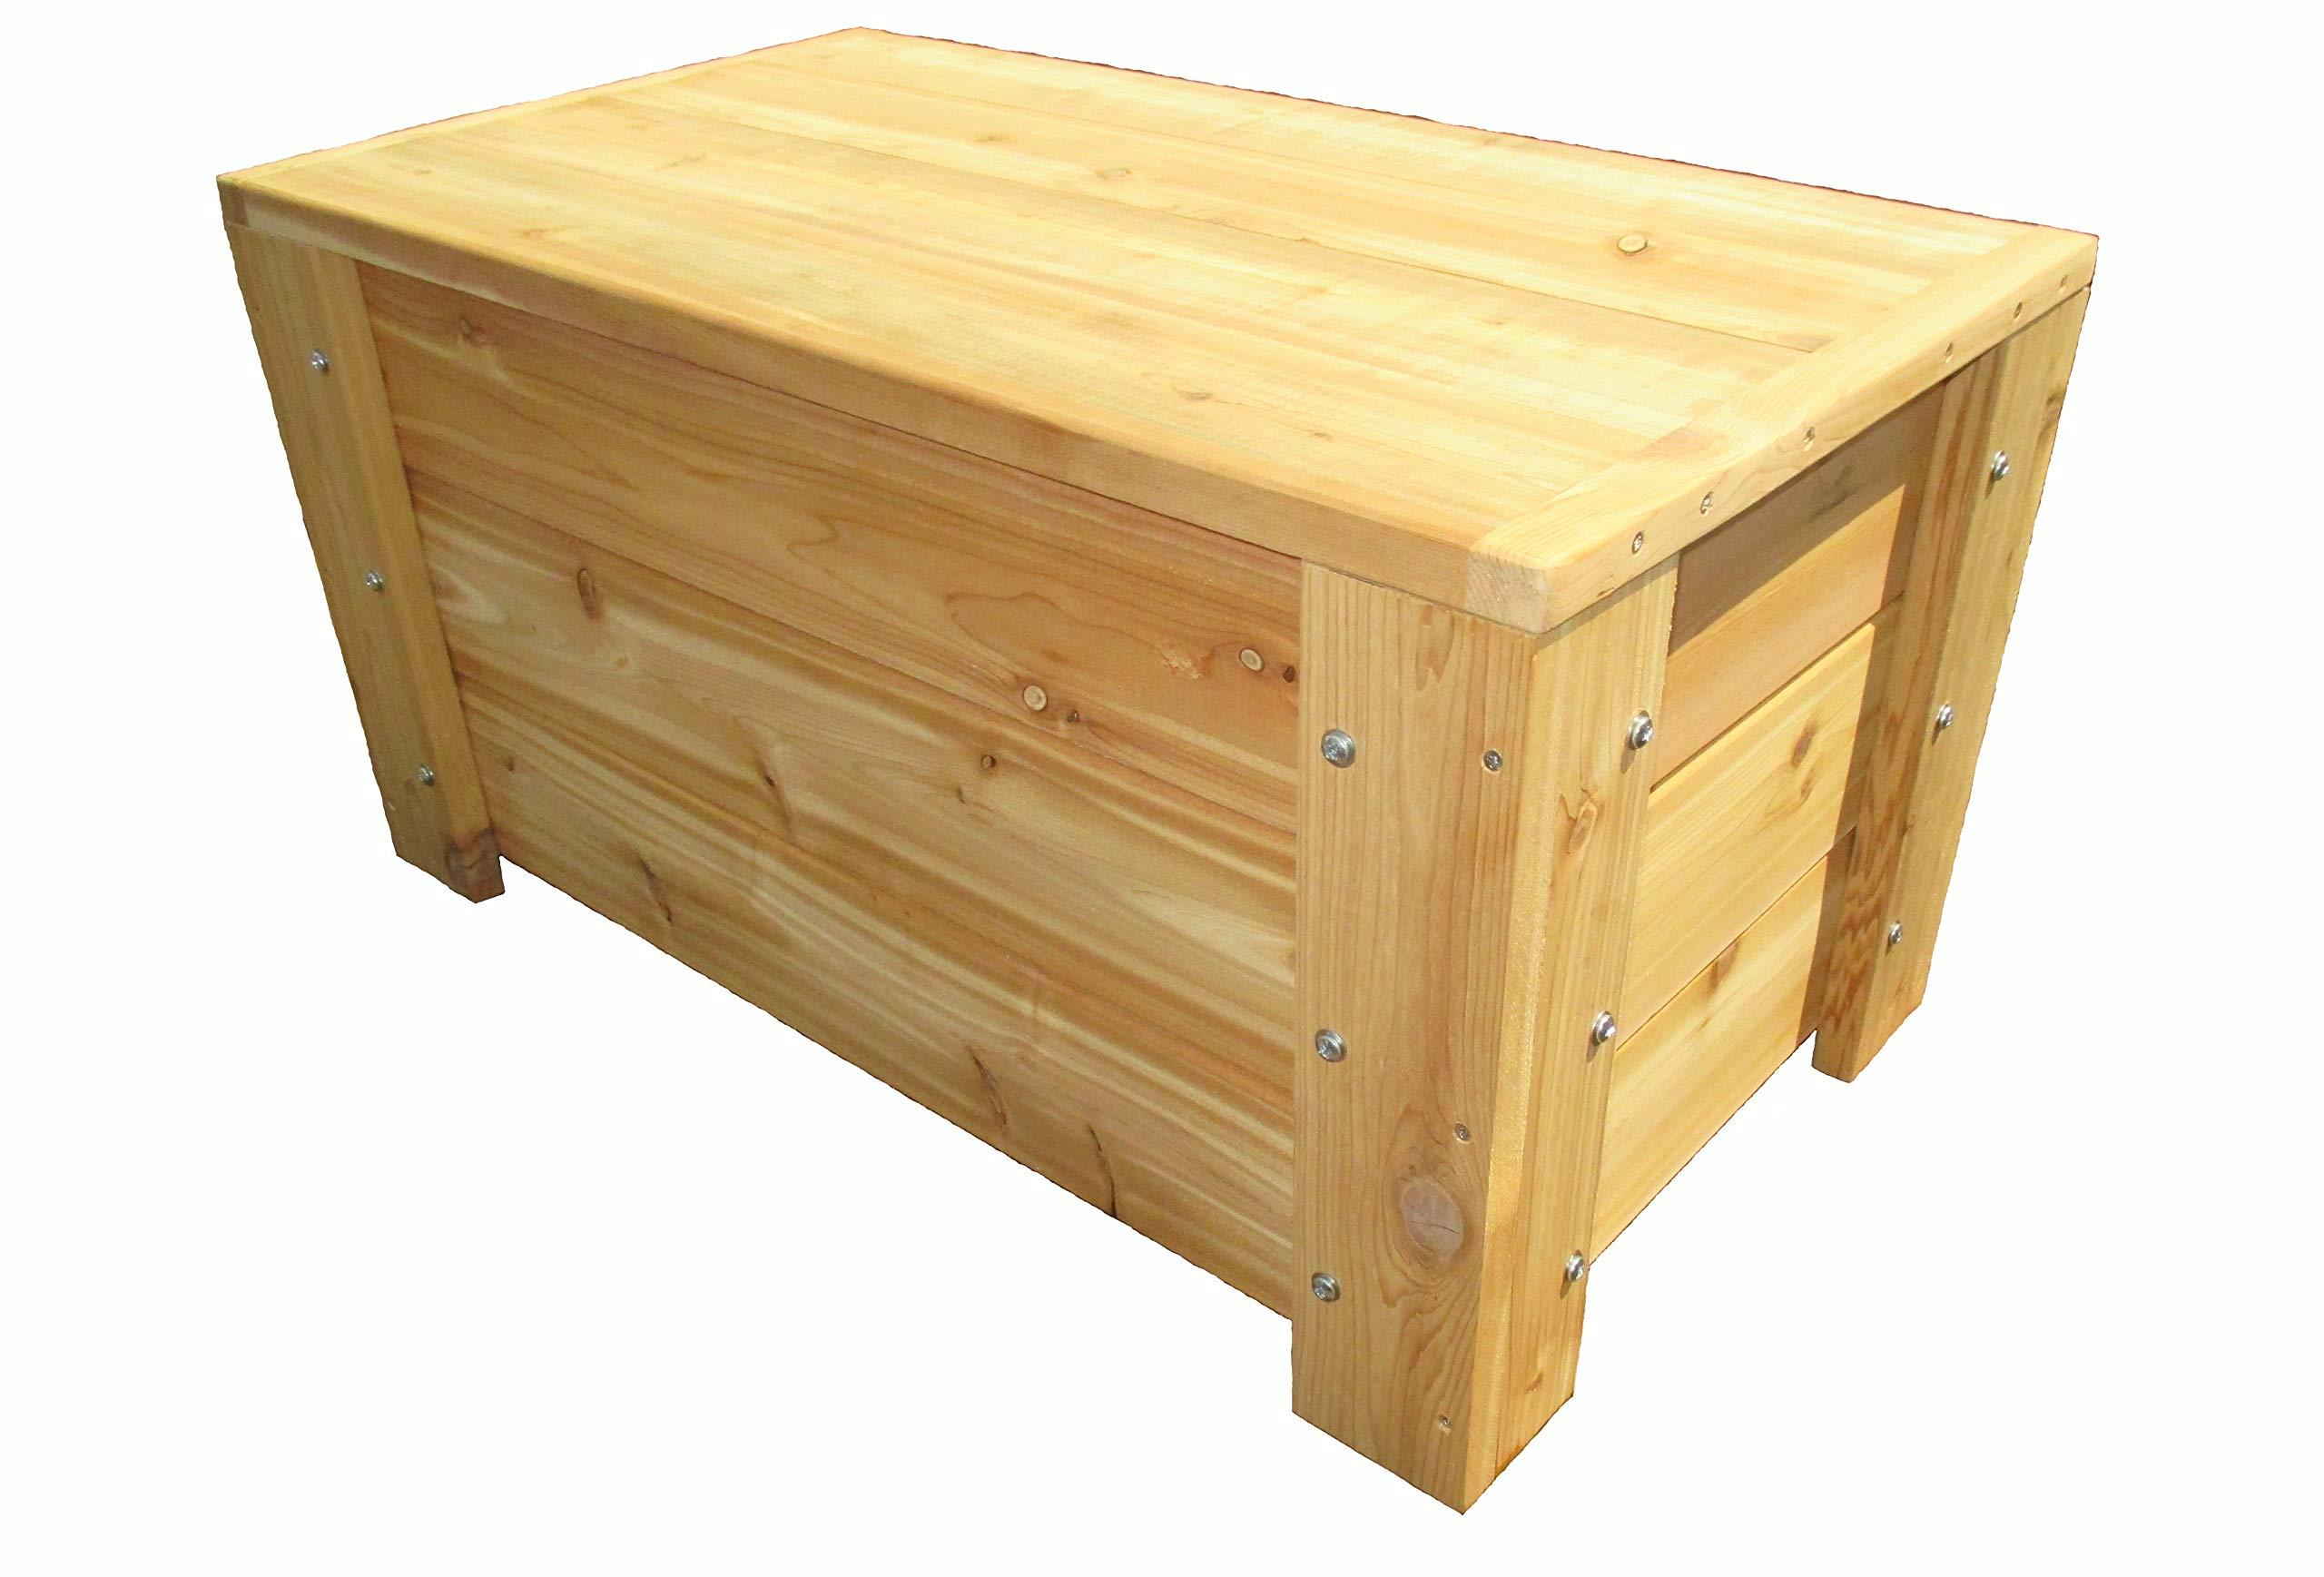 Premium Quality Indoors/Outdoors Cedar Storage Bench by Infinite Cedar